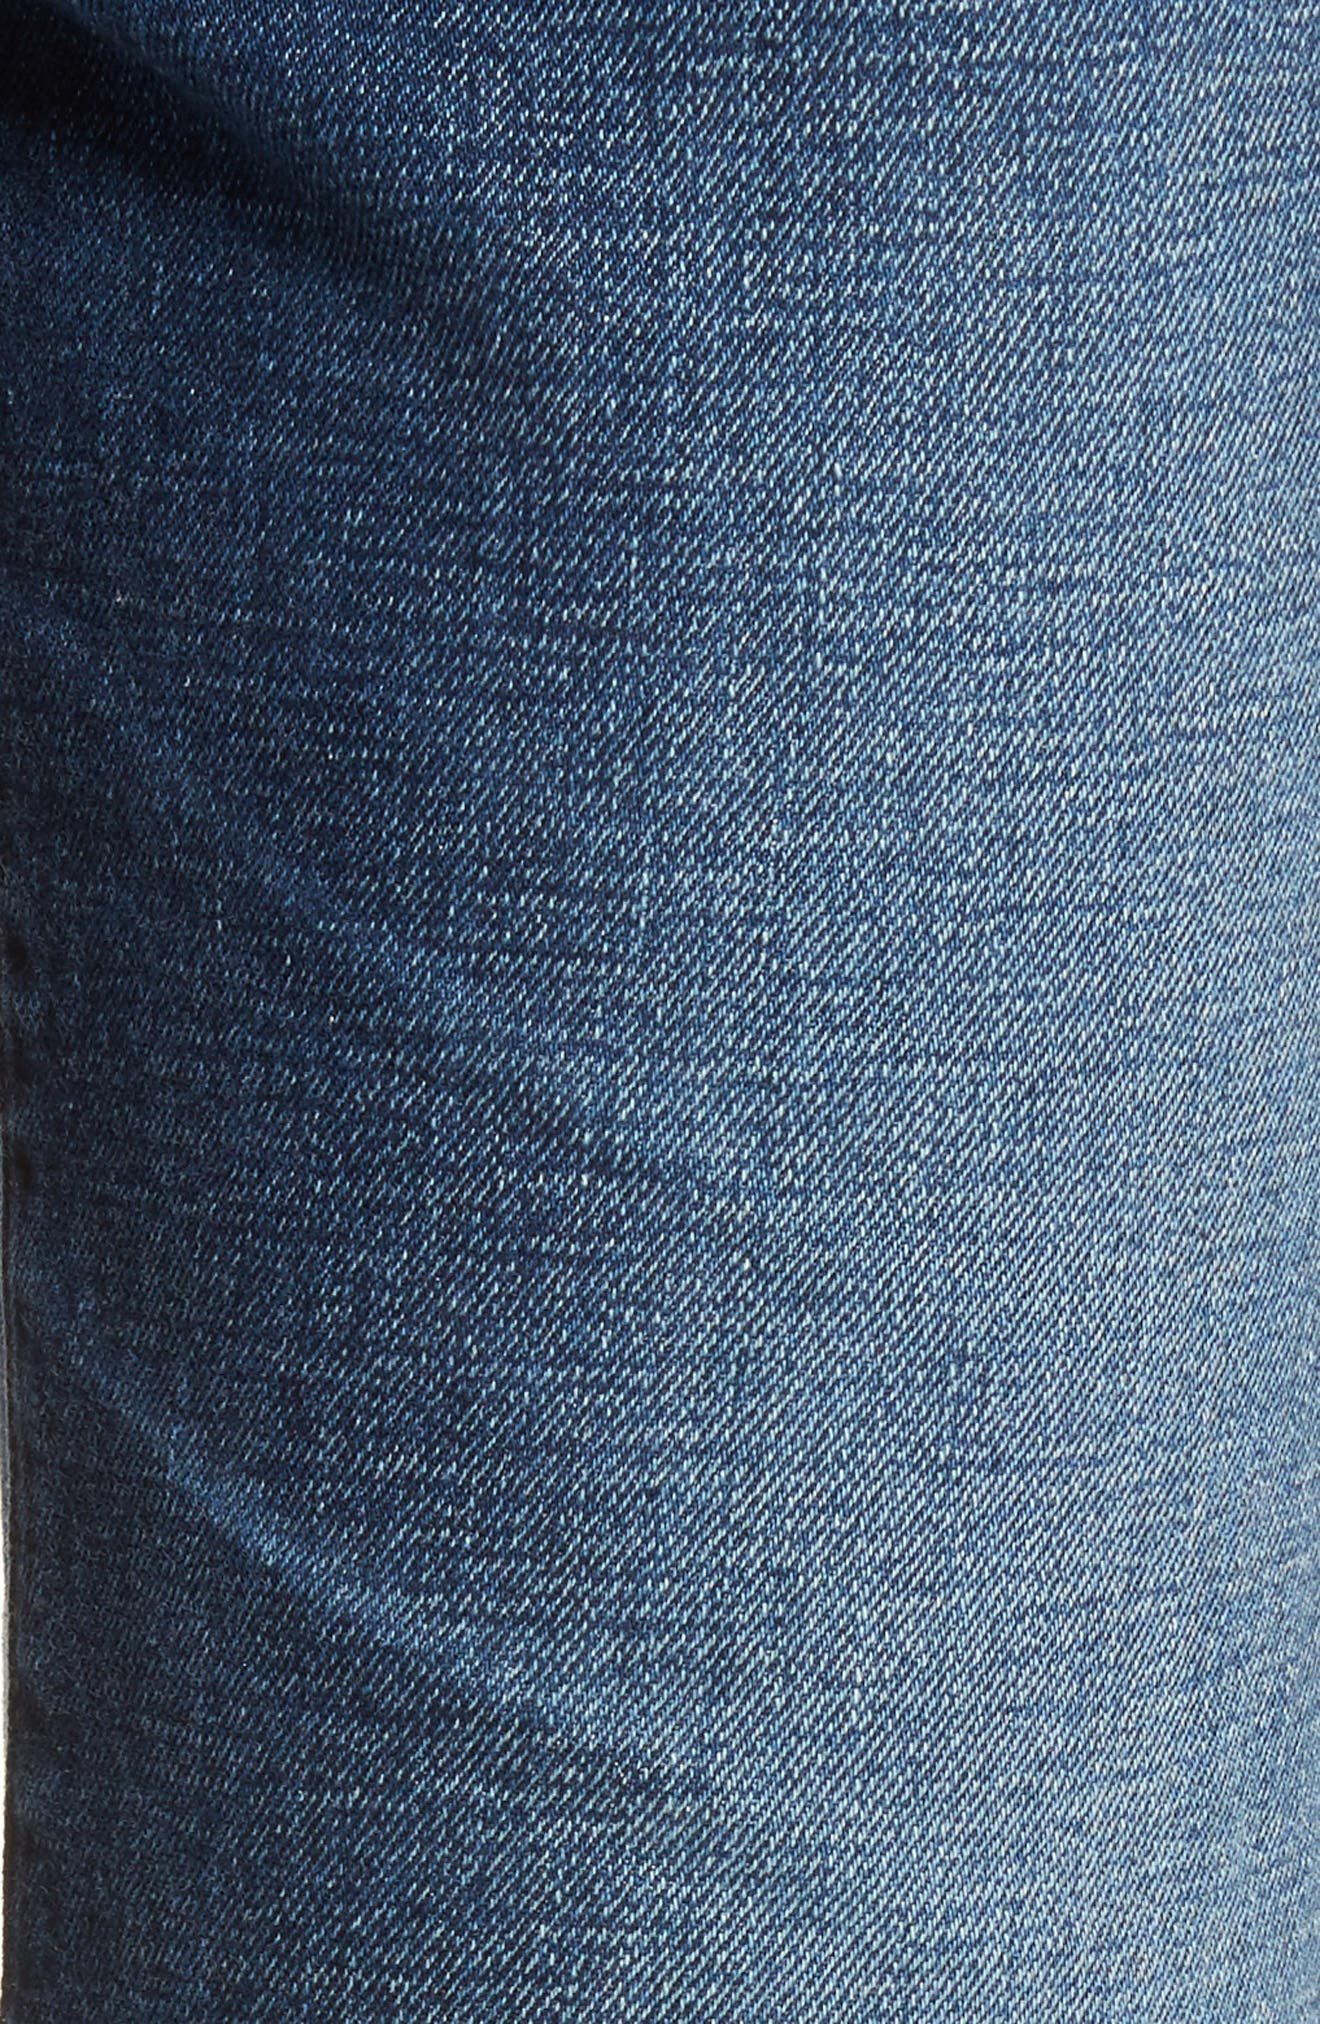 The Rhett Vintage High Waist Crop Jeans,                             Alternate thumbnail 7, color,                             11 Years Jubilee